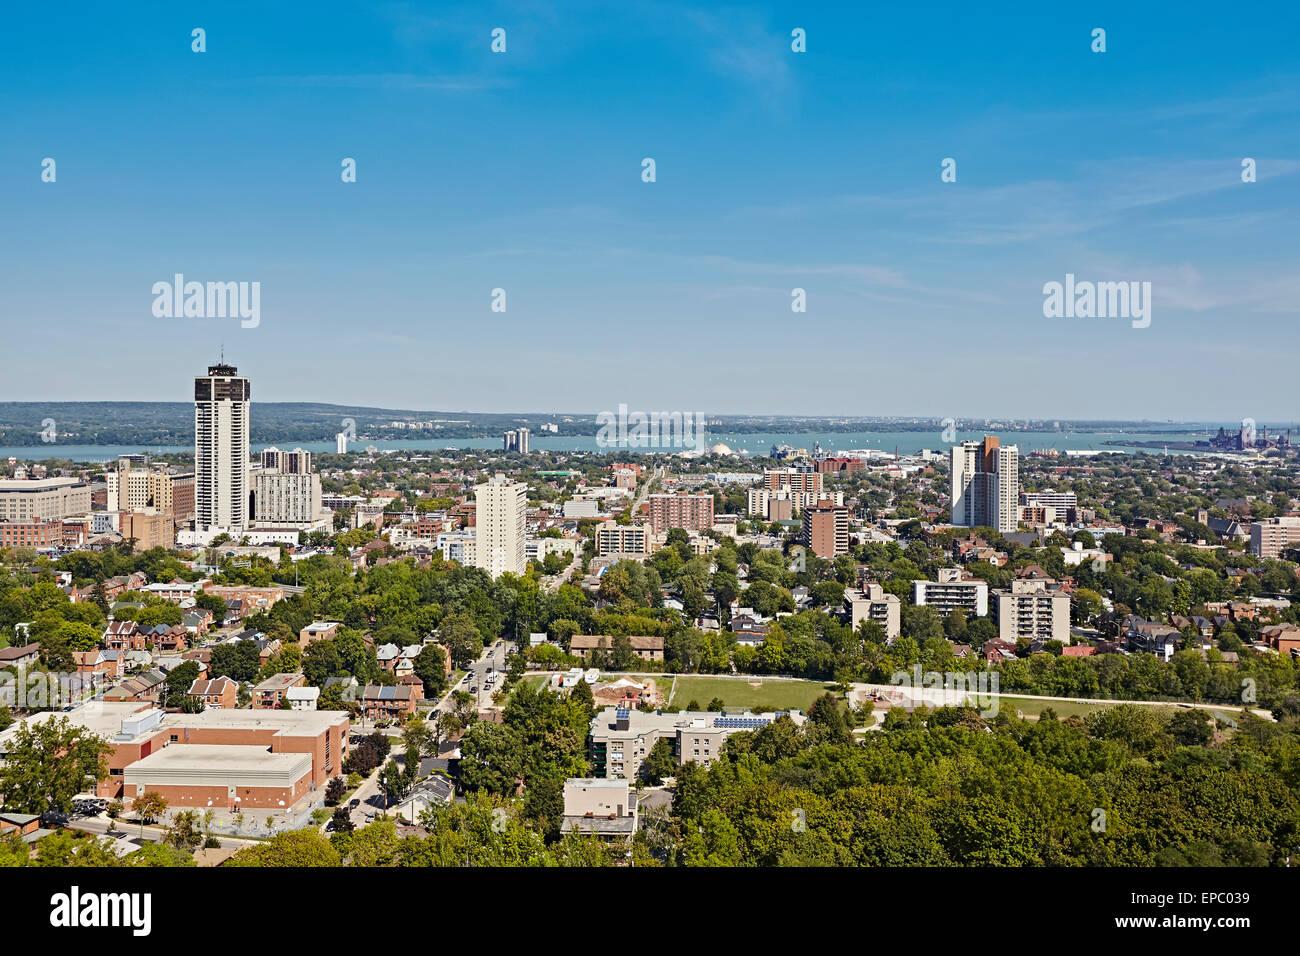 Downtown Hamilton Viewed From The Escarpment Hamilton Ontario Stock Photo Royalty Free Image